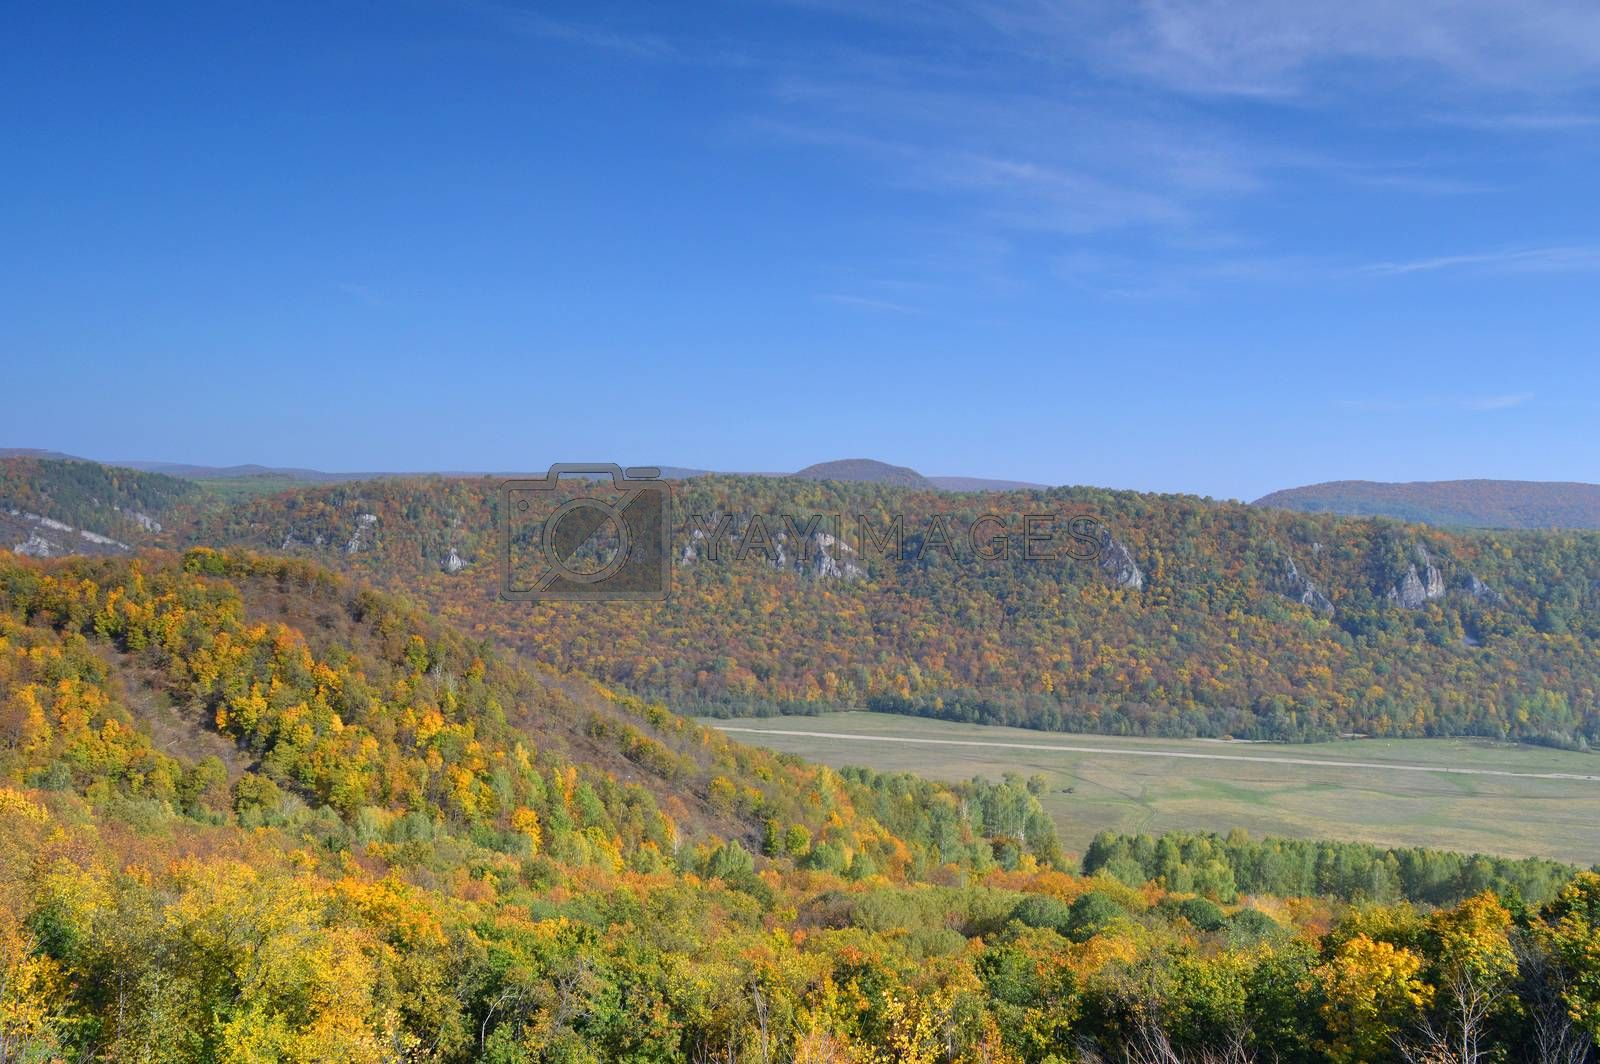 Autumn landscape, tree over mountains